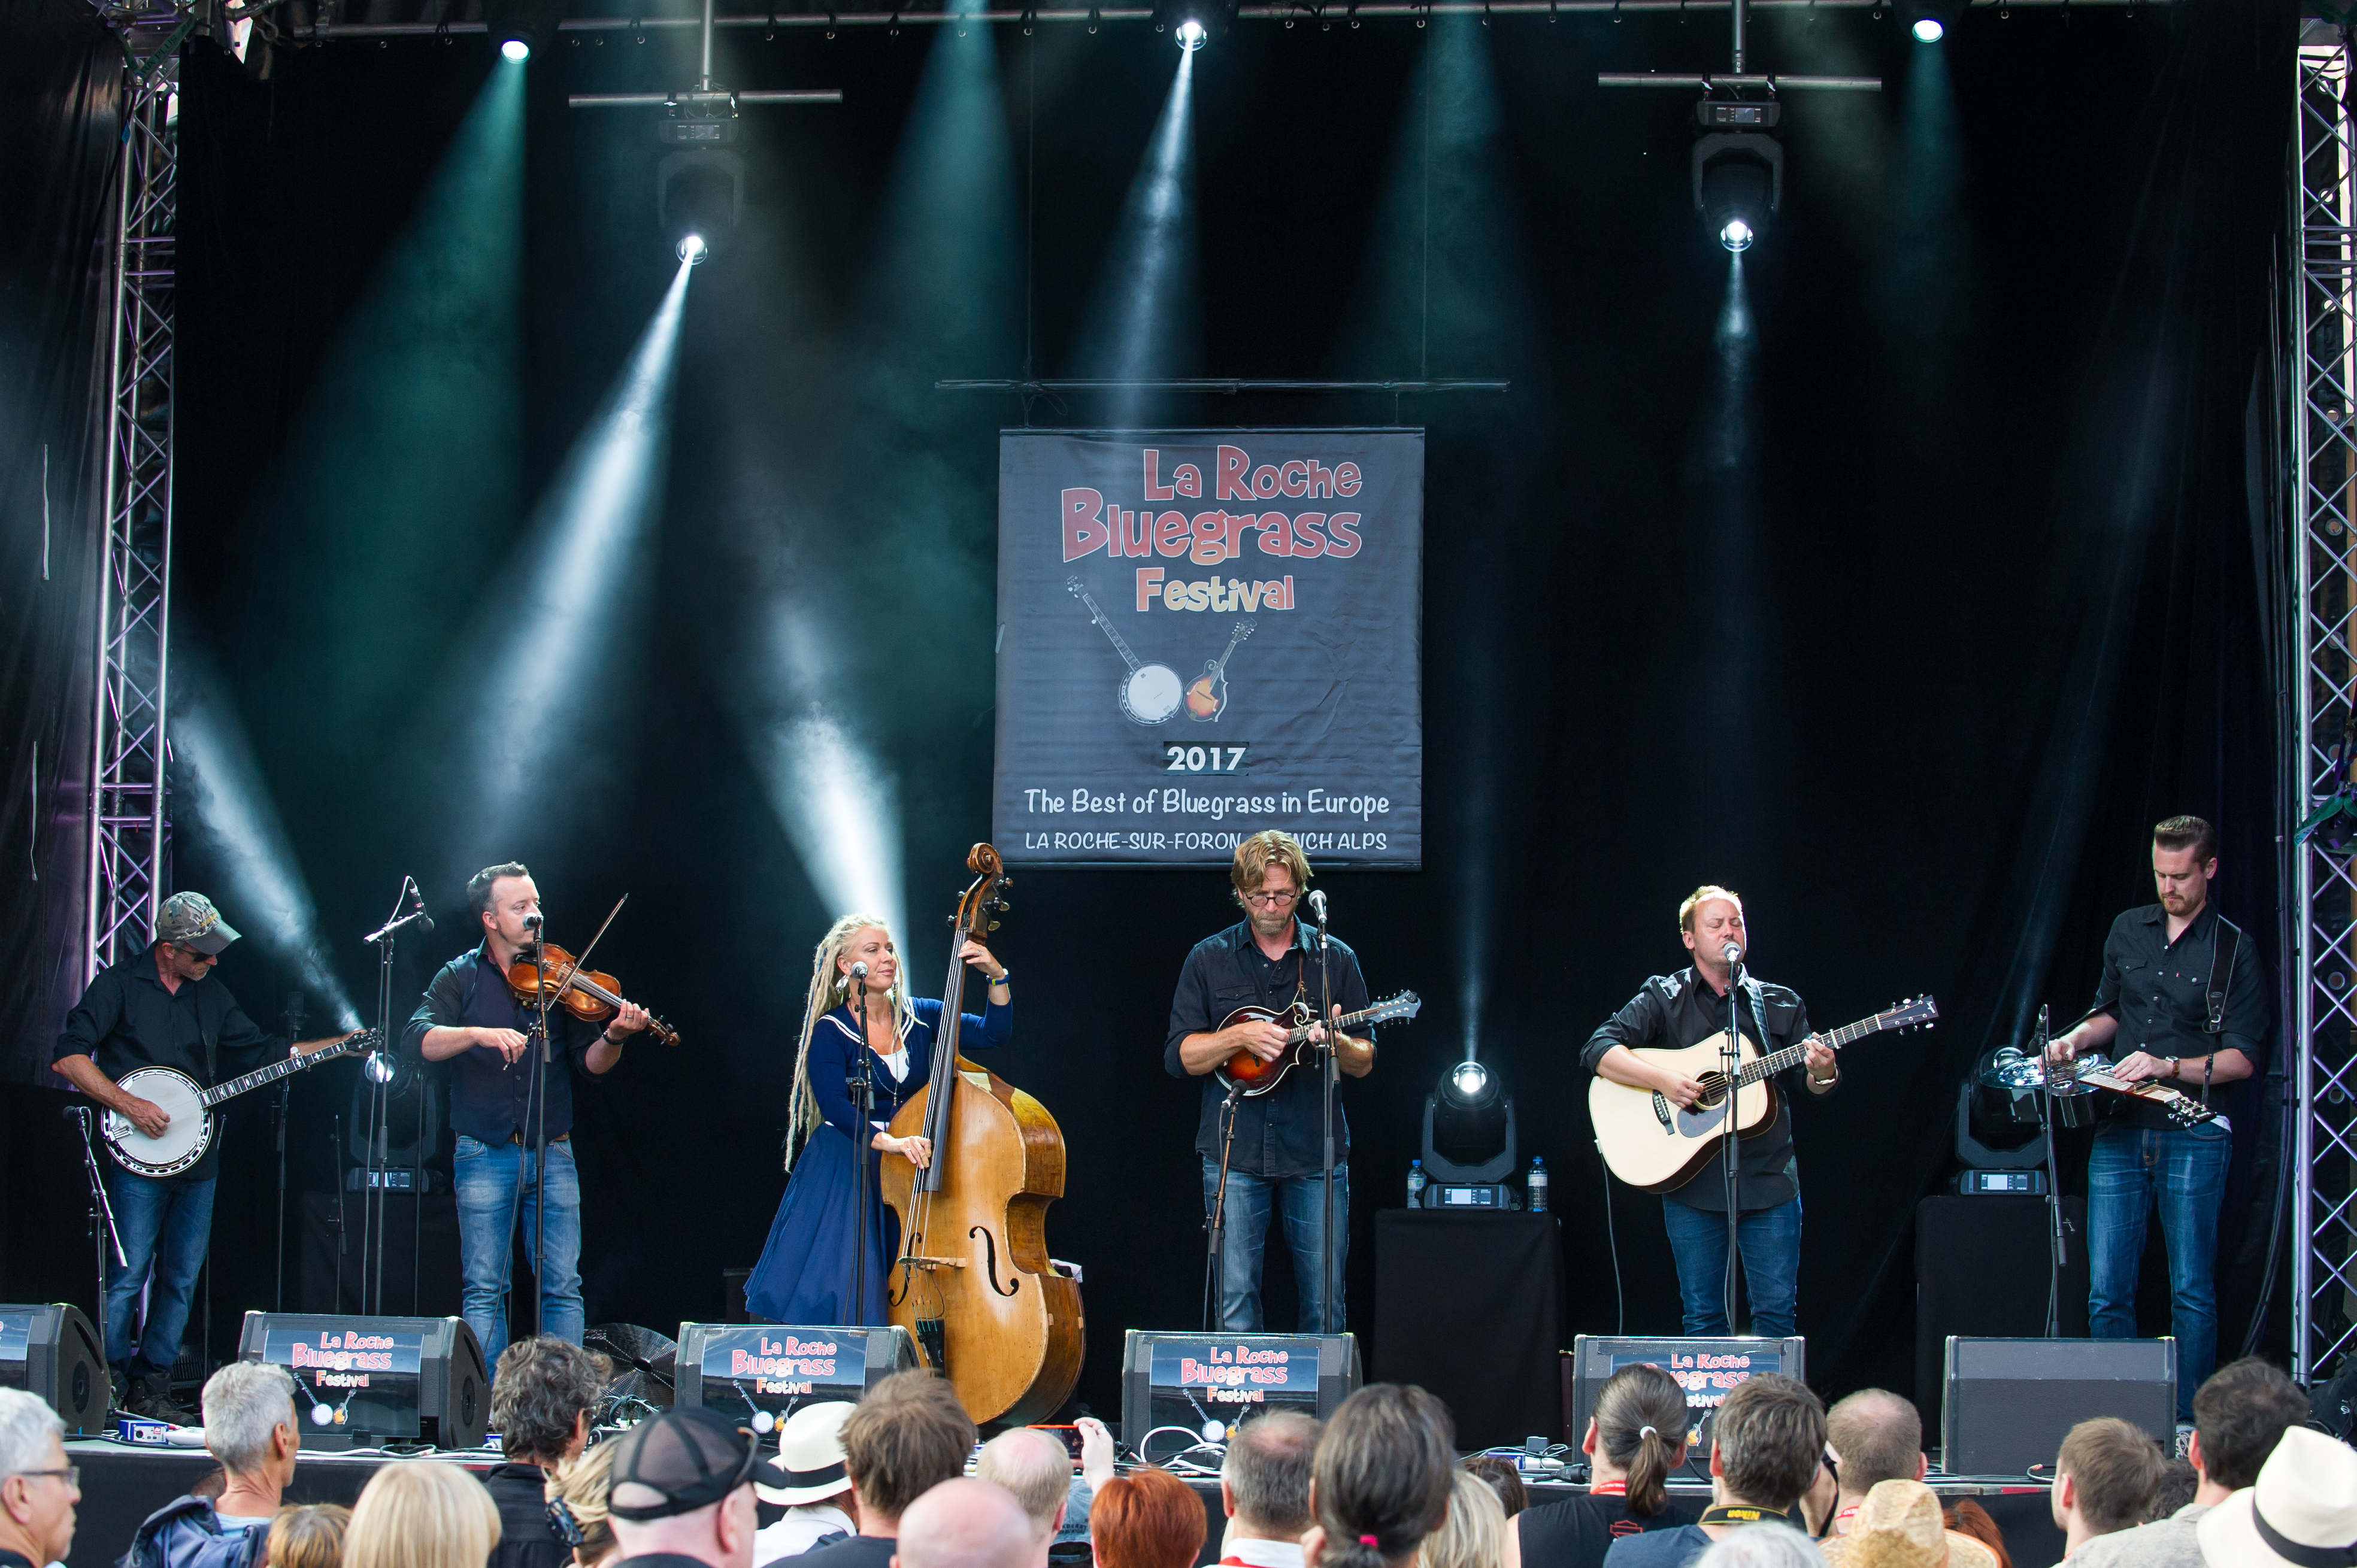 Downhill Bluegrass Band La Roche Bluegrass Festival 2017